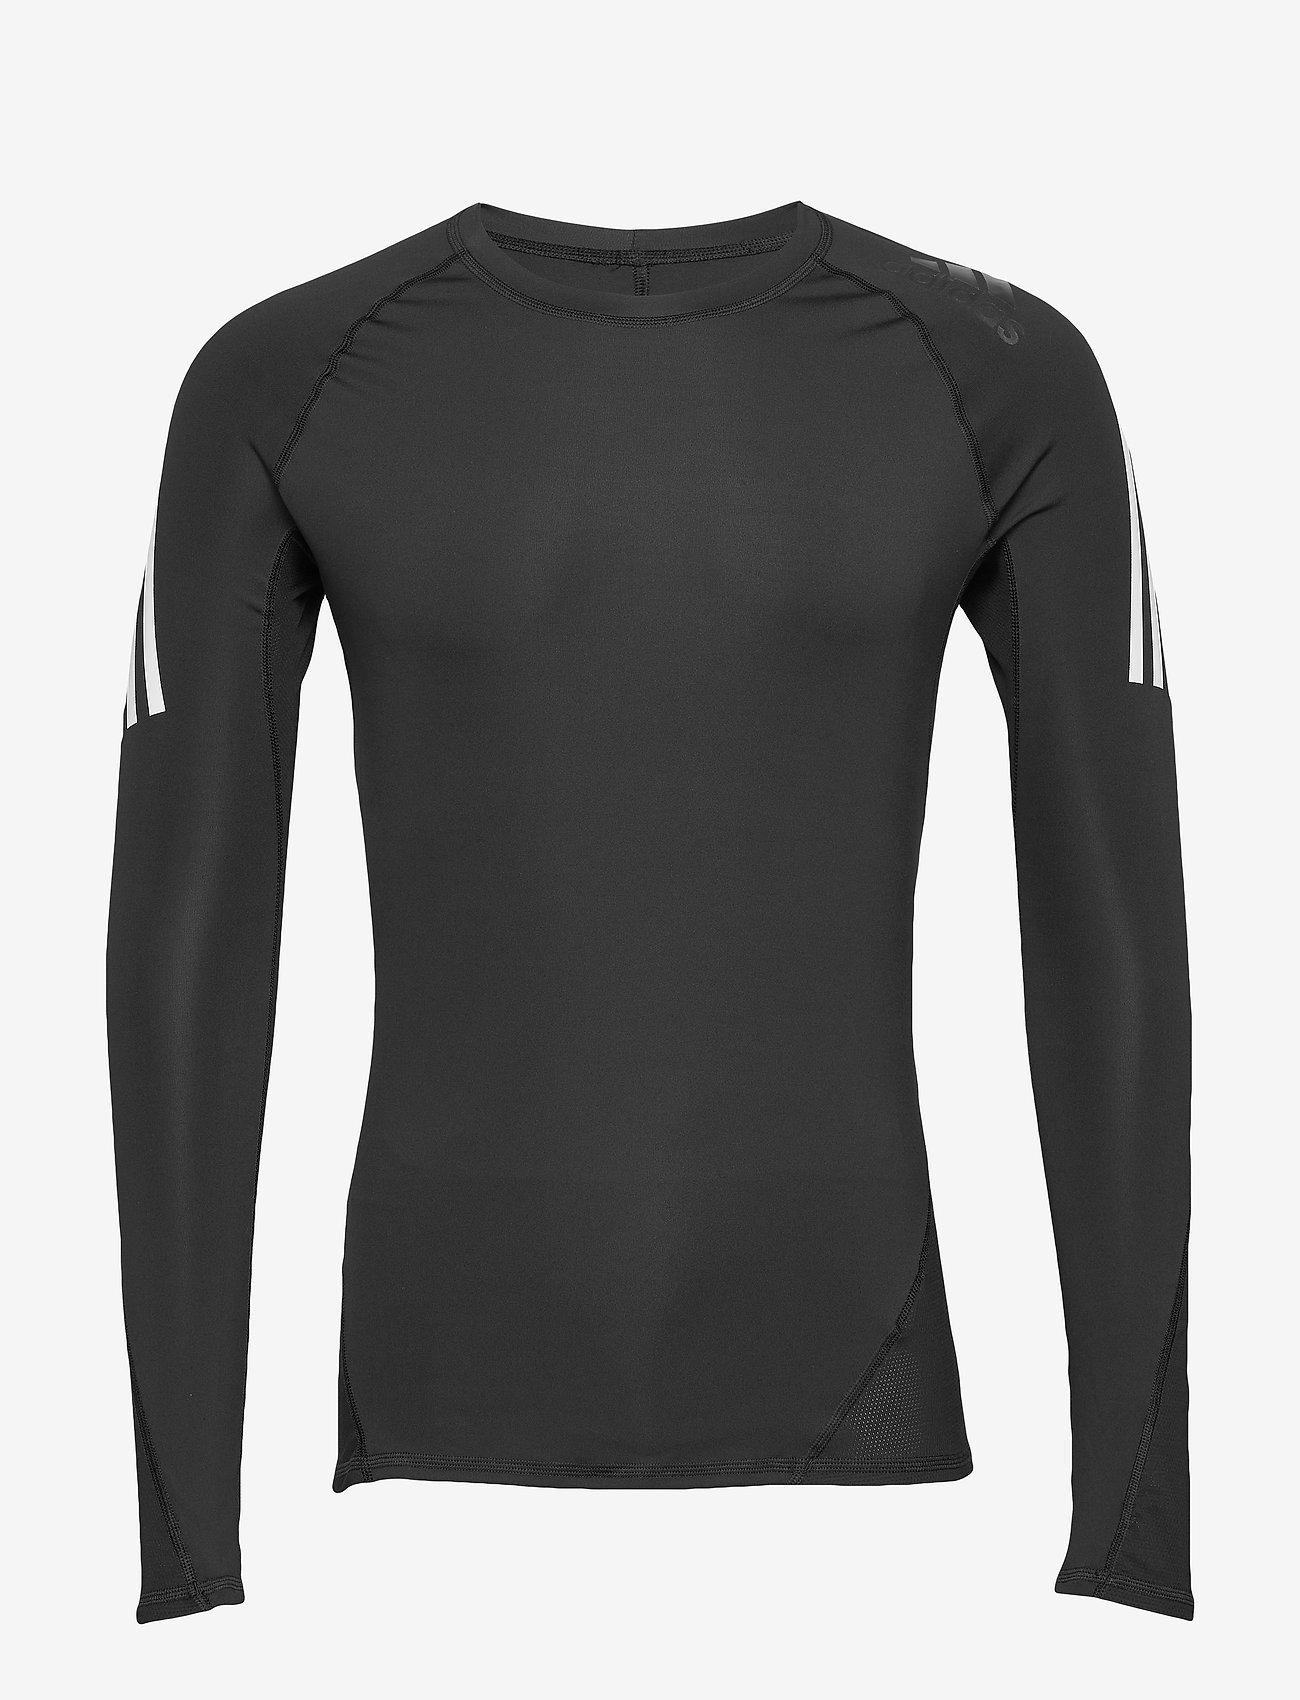 adidas Performance - ASK SPR LS 3S - langarmshirts - black - 1